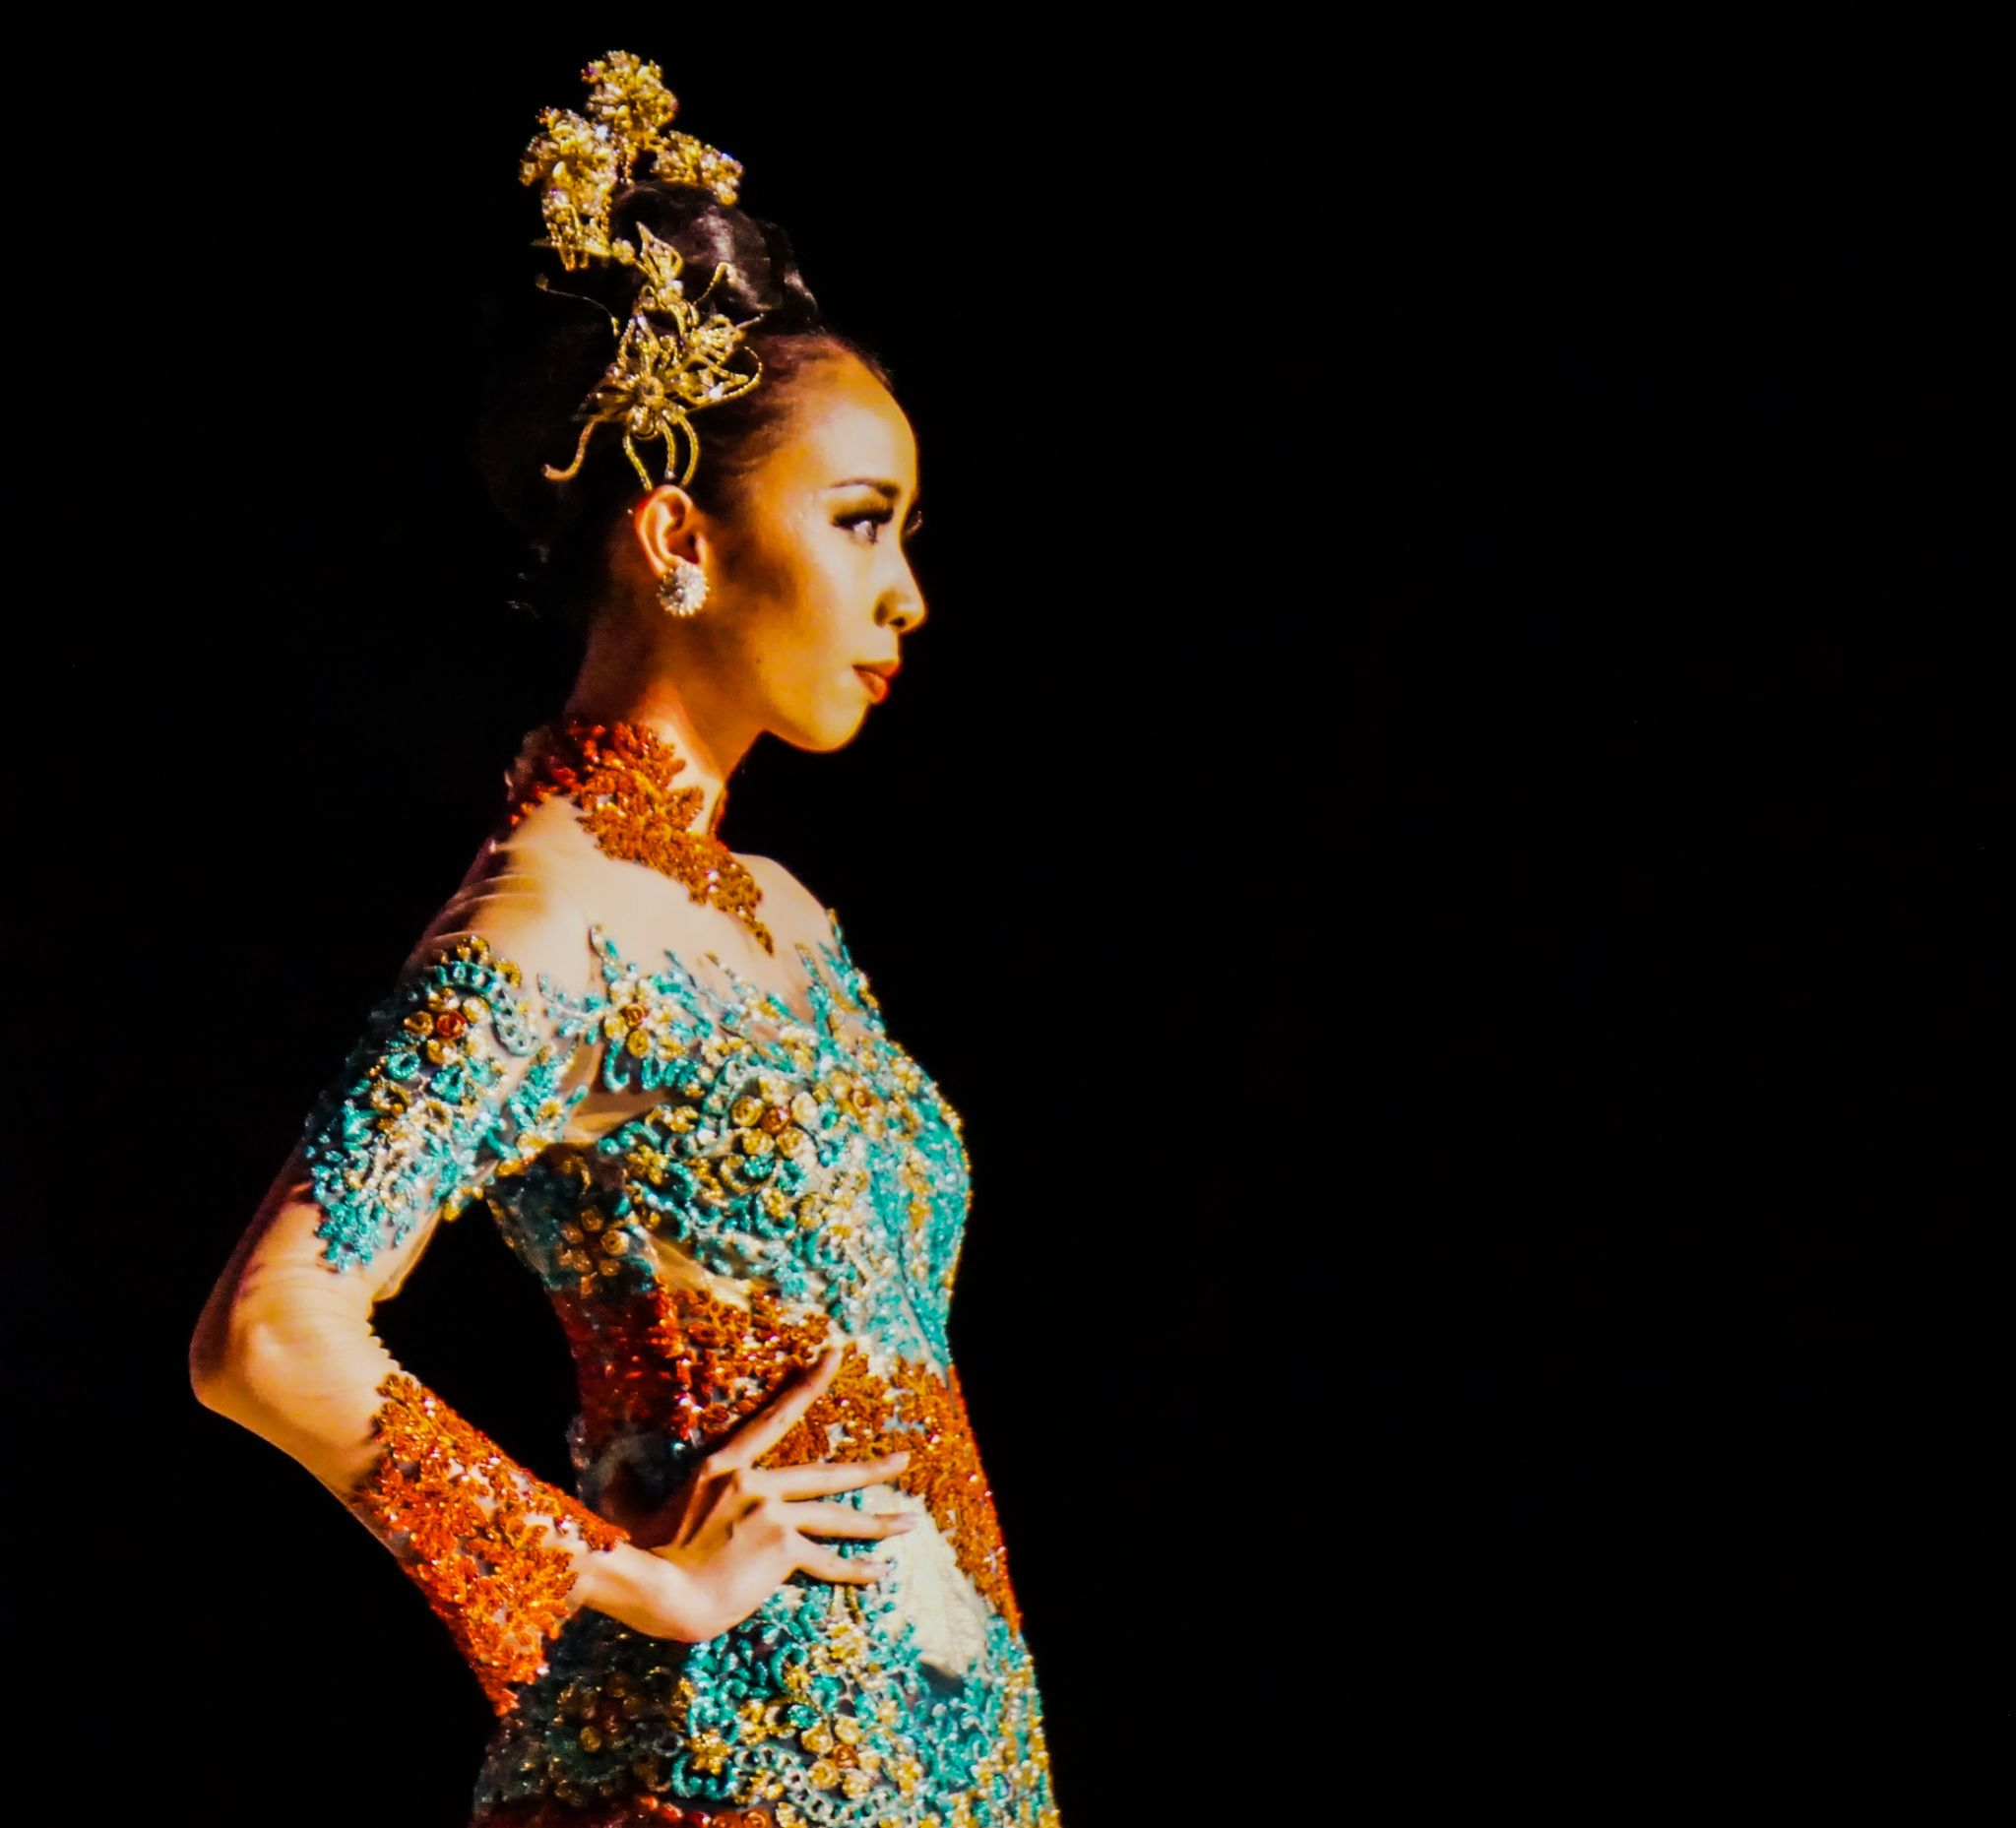 Solo Batik Fashion by Ferry Chandra